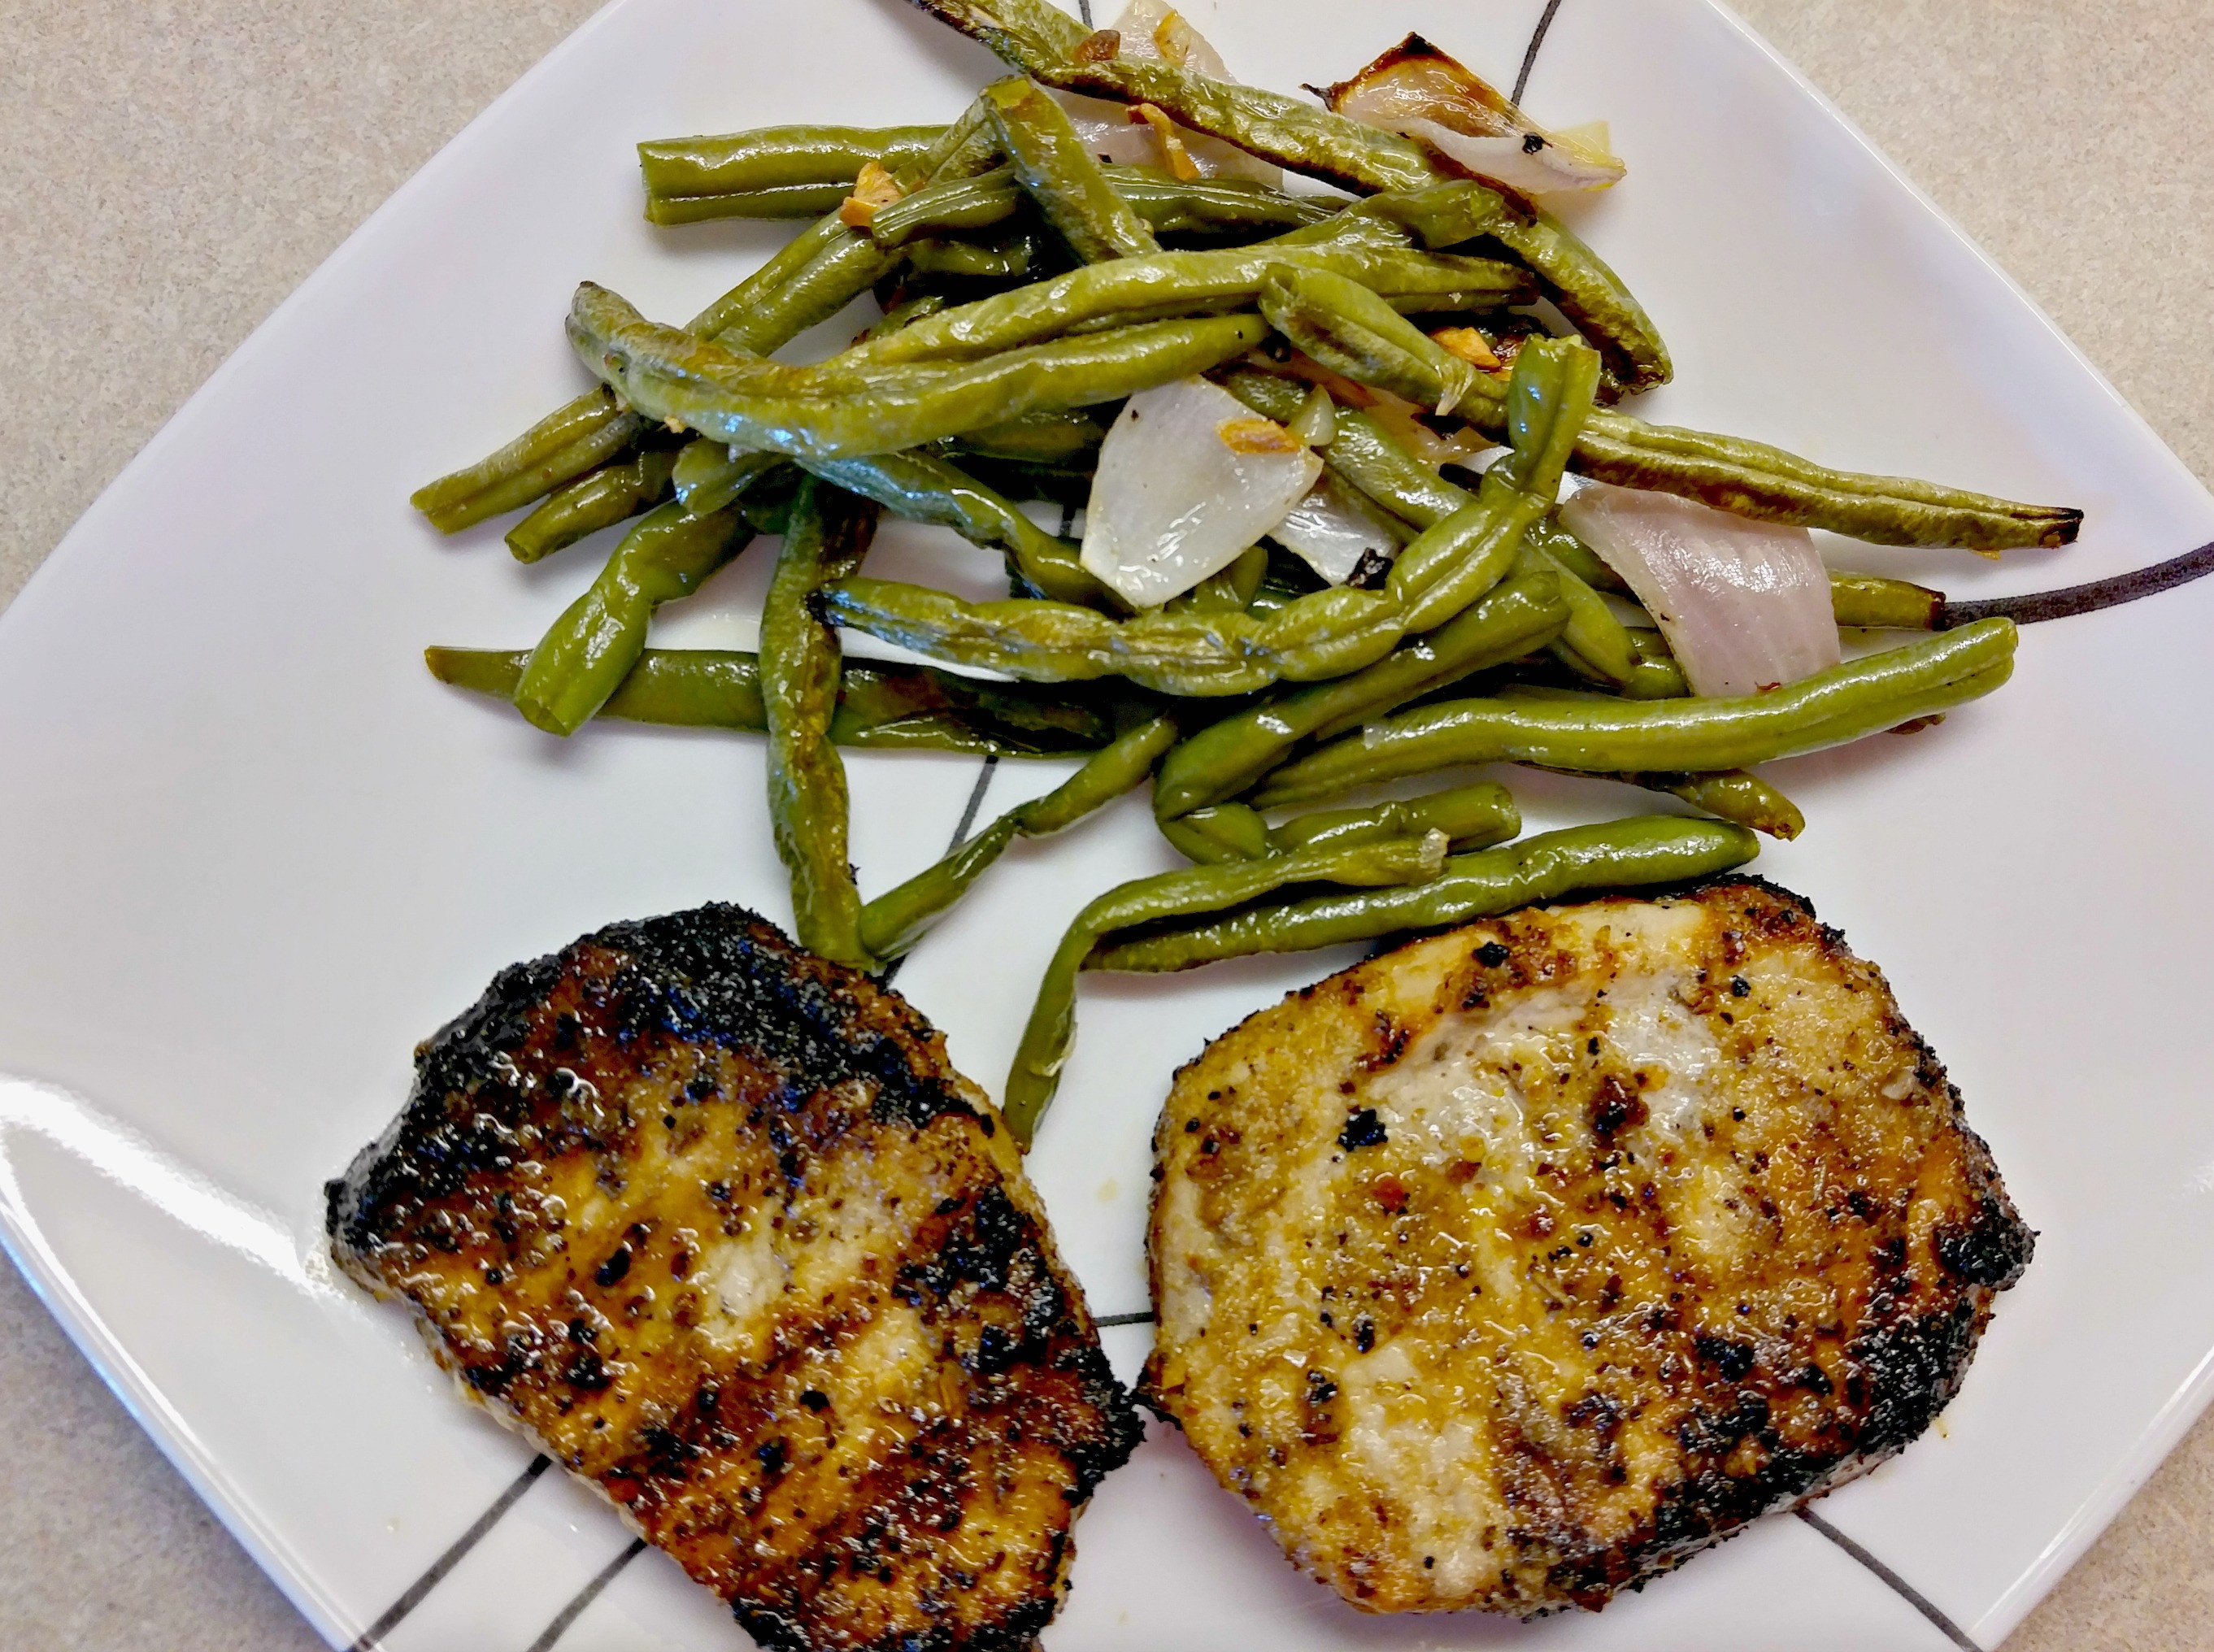 Heart Healthy Pork Chops  Grilled Pork Chops & Green Beans Heart Healthy — SIMPLY